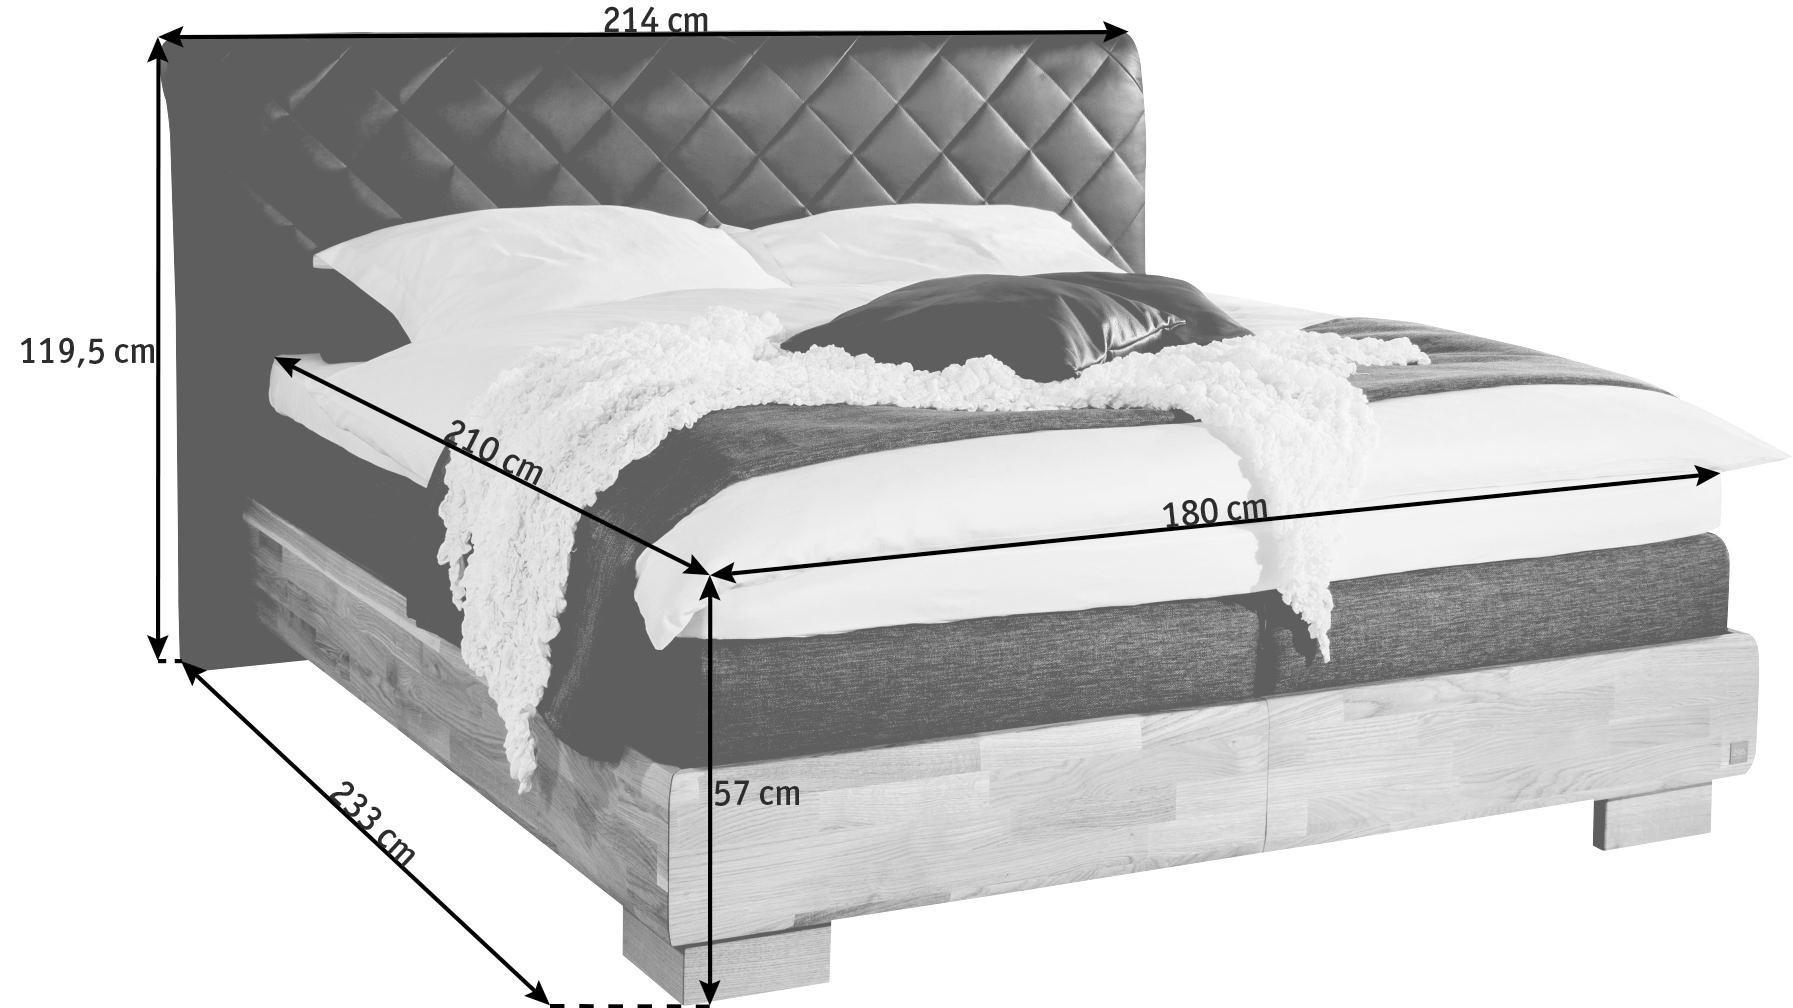 BOXSPRINGBETT 180/210 cm  INKL. Matratze, Topper - Eichefarben/Braun, KONVENTIONELL, Leder/Holz (180/210cm) - NOVEL